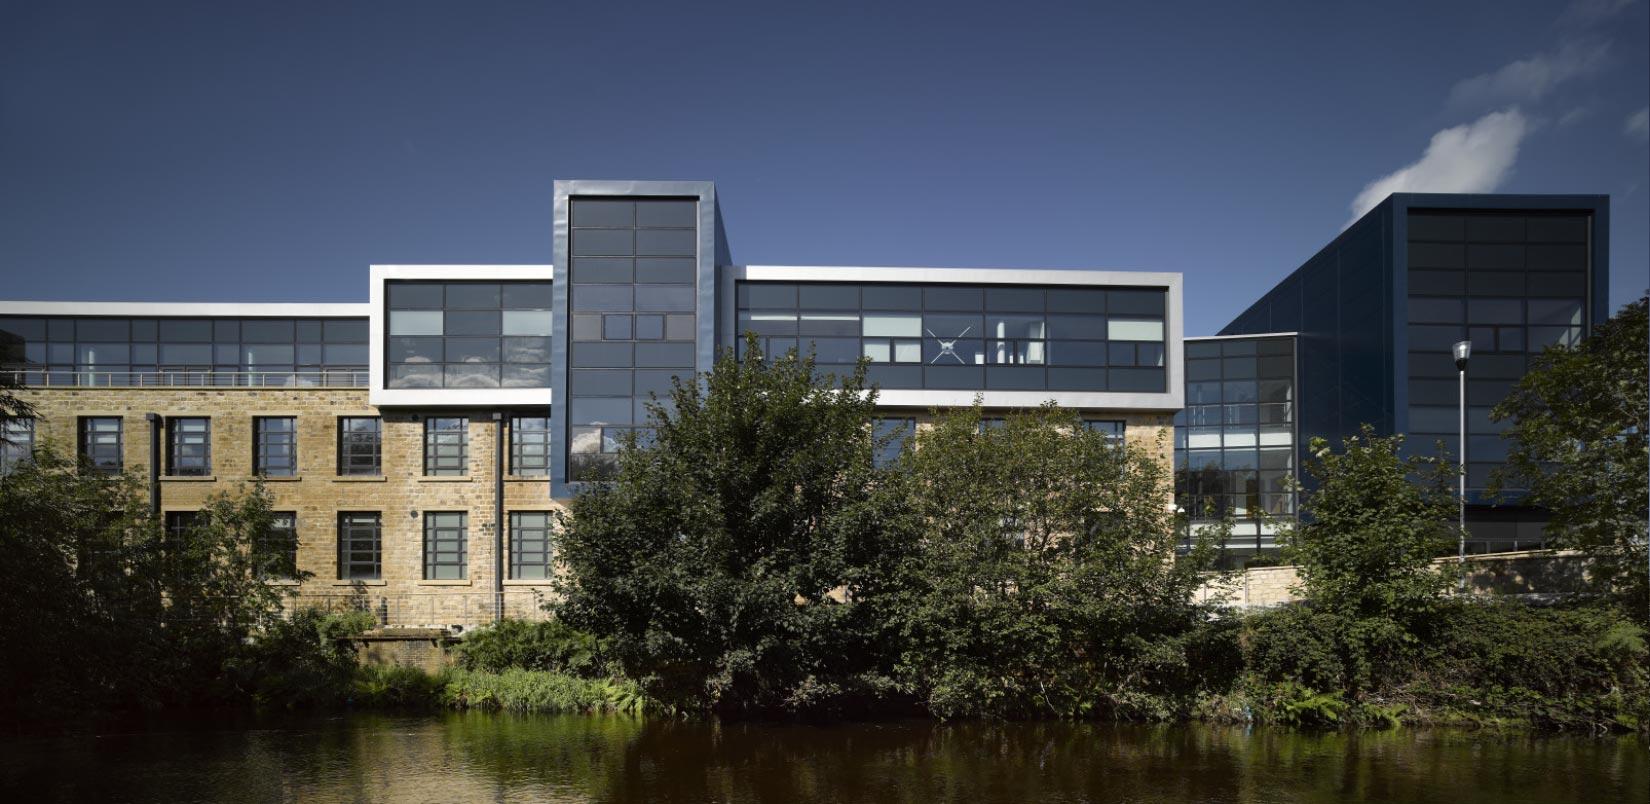 Larchfield Mills, Huddersfield University, View across the river